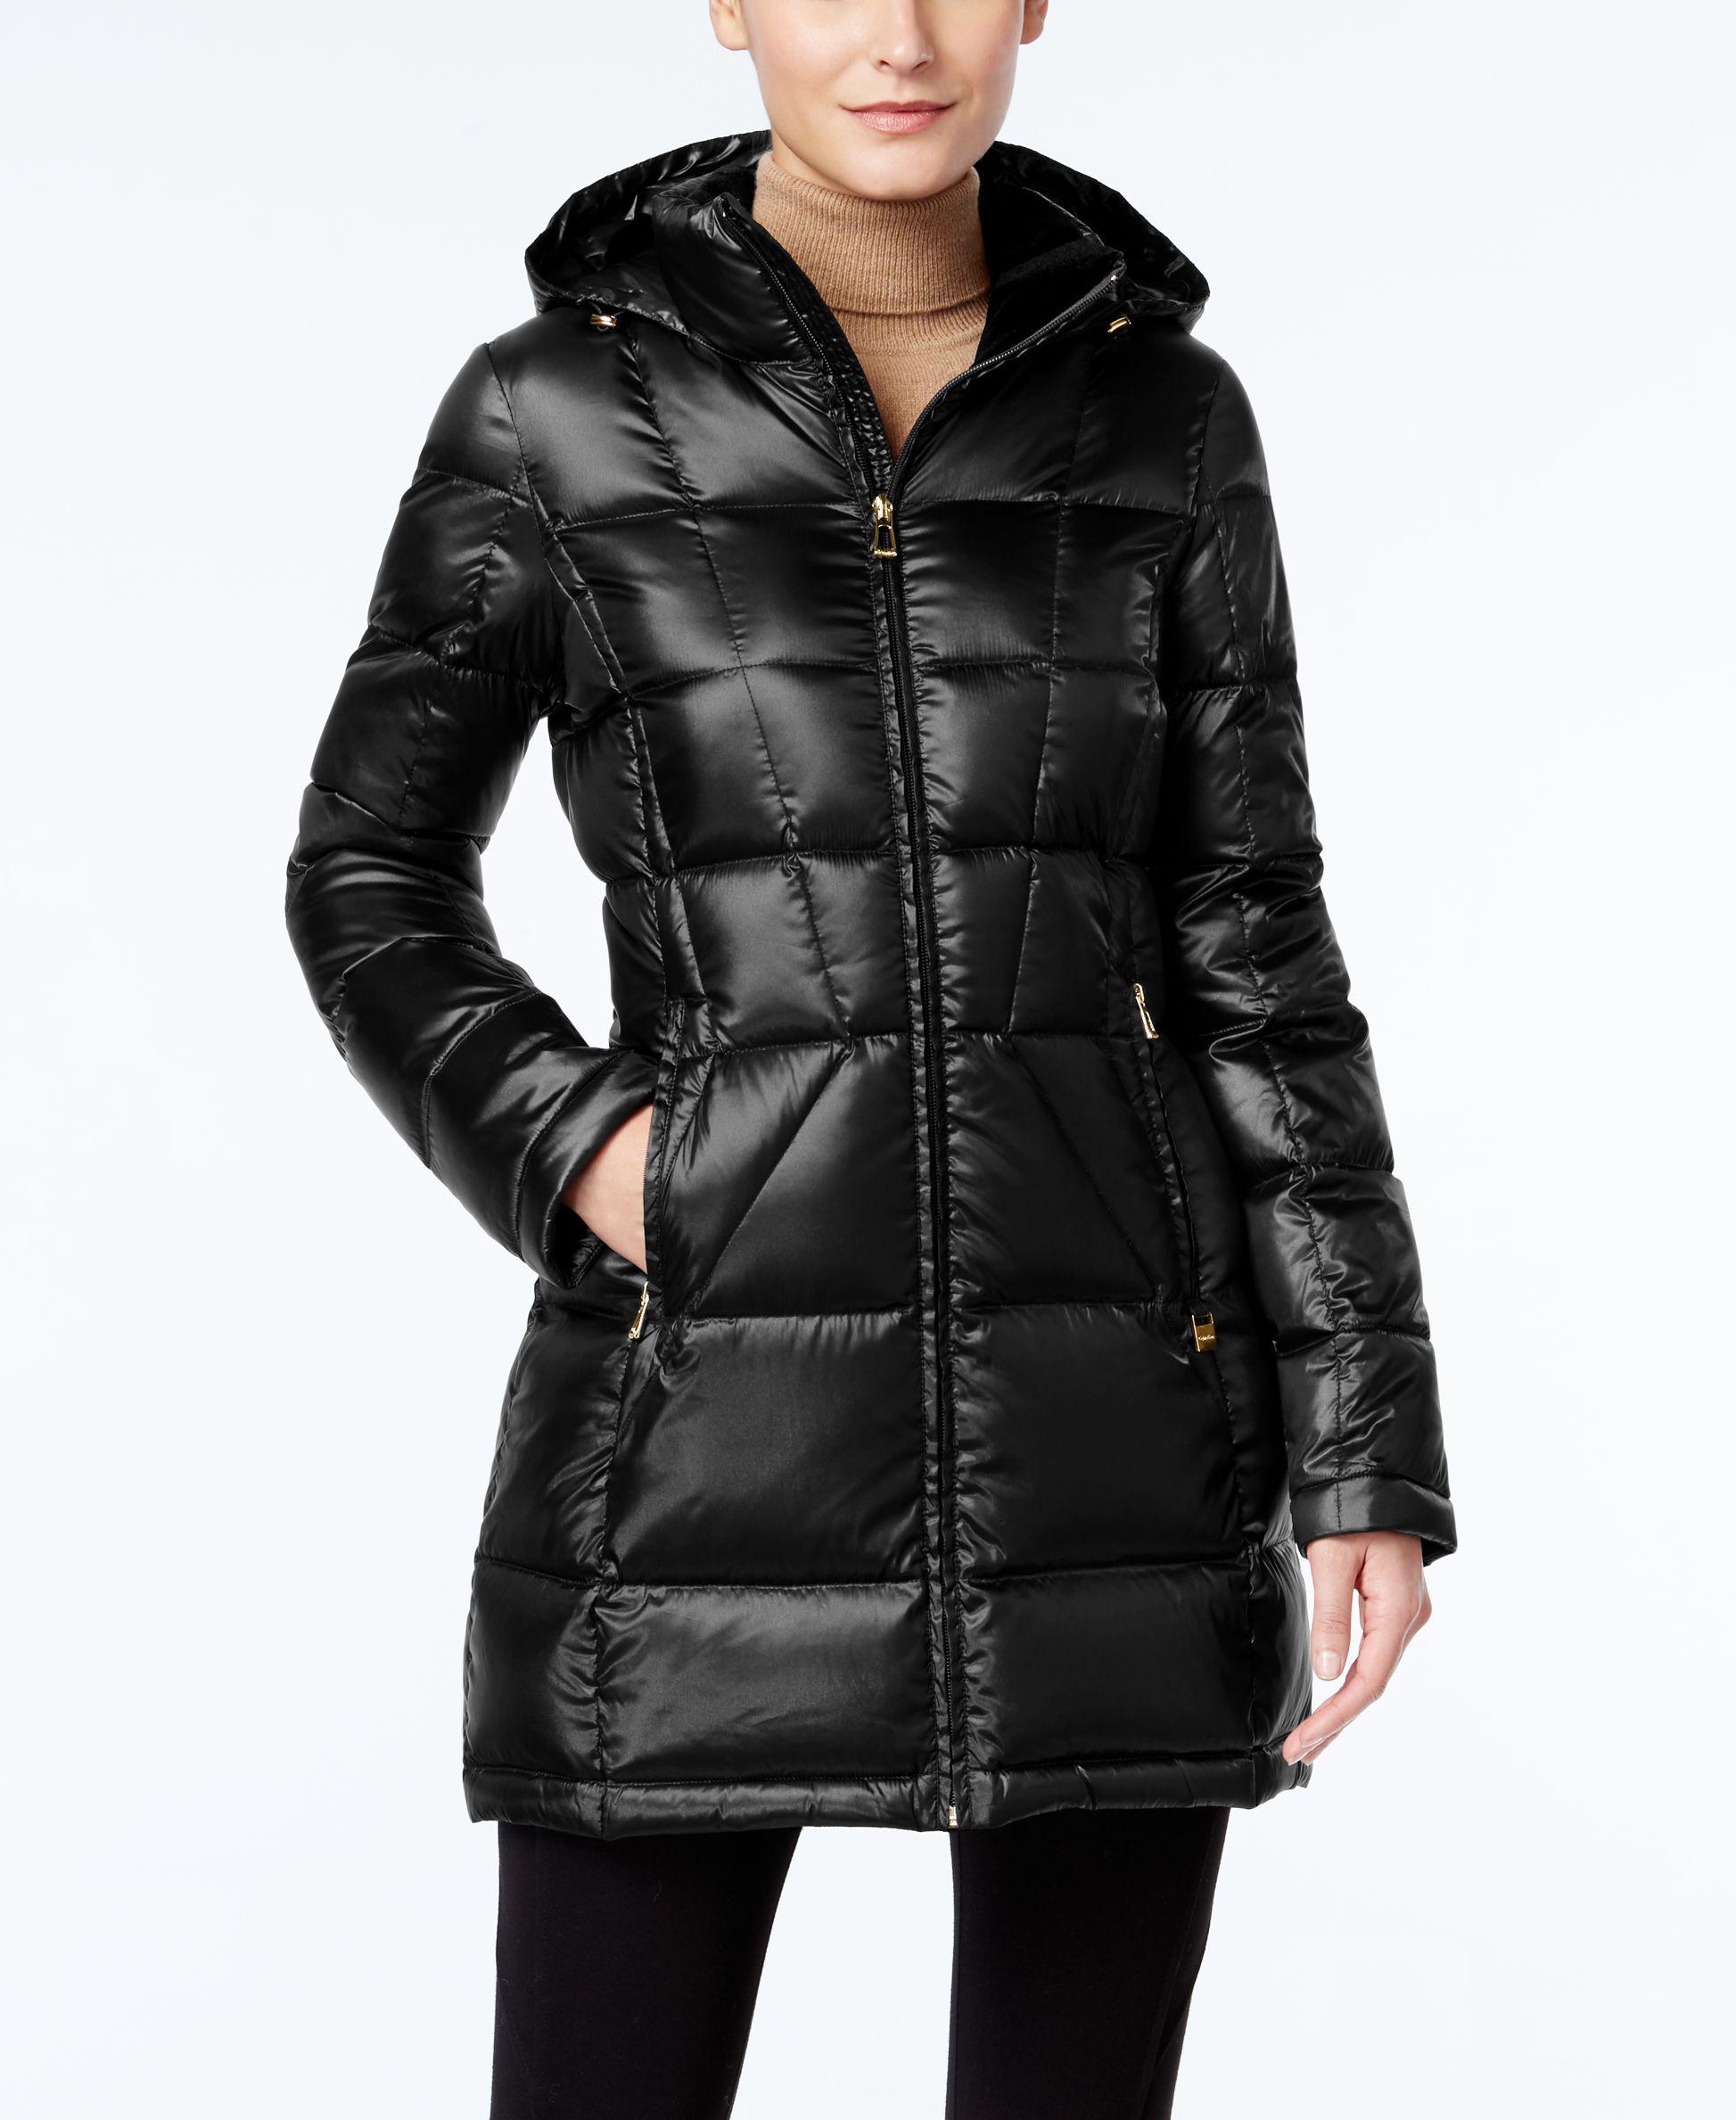 Calvin Klein Hooded Packable Down Puffer Coat Down Puffer Coat Puffer Coat Women S Puffer Coats [ 2378 x 1947 Pixel ]